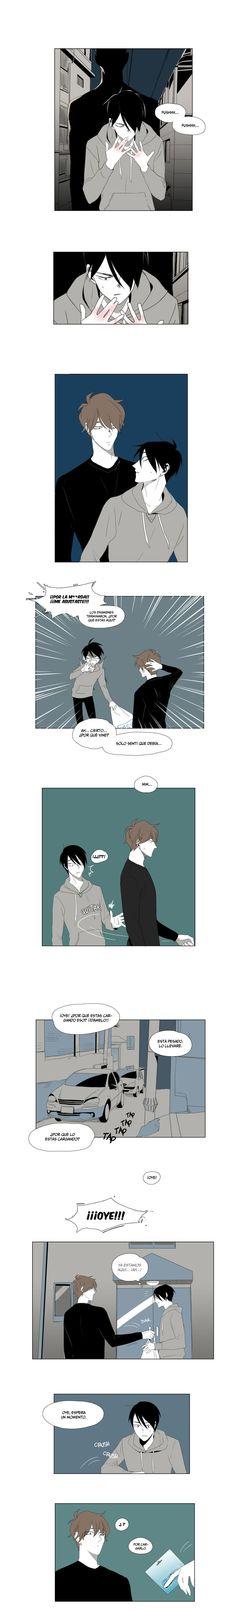 Manga Bagjwi Sayug -Raising a Bat- cápitulo 9 página 000a_211934.jpg